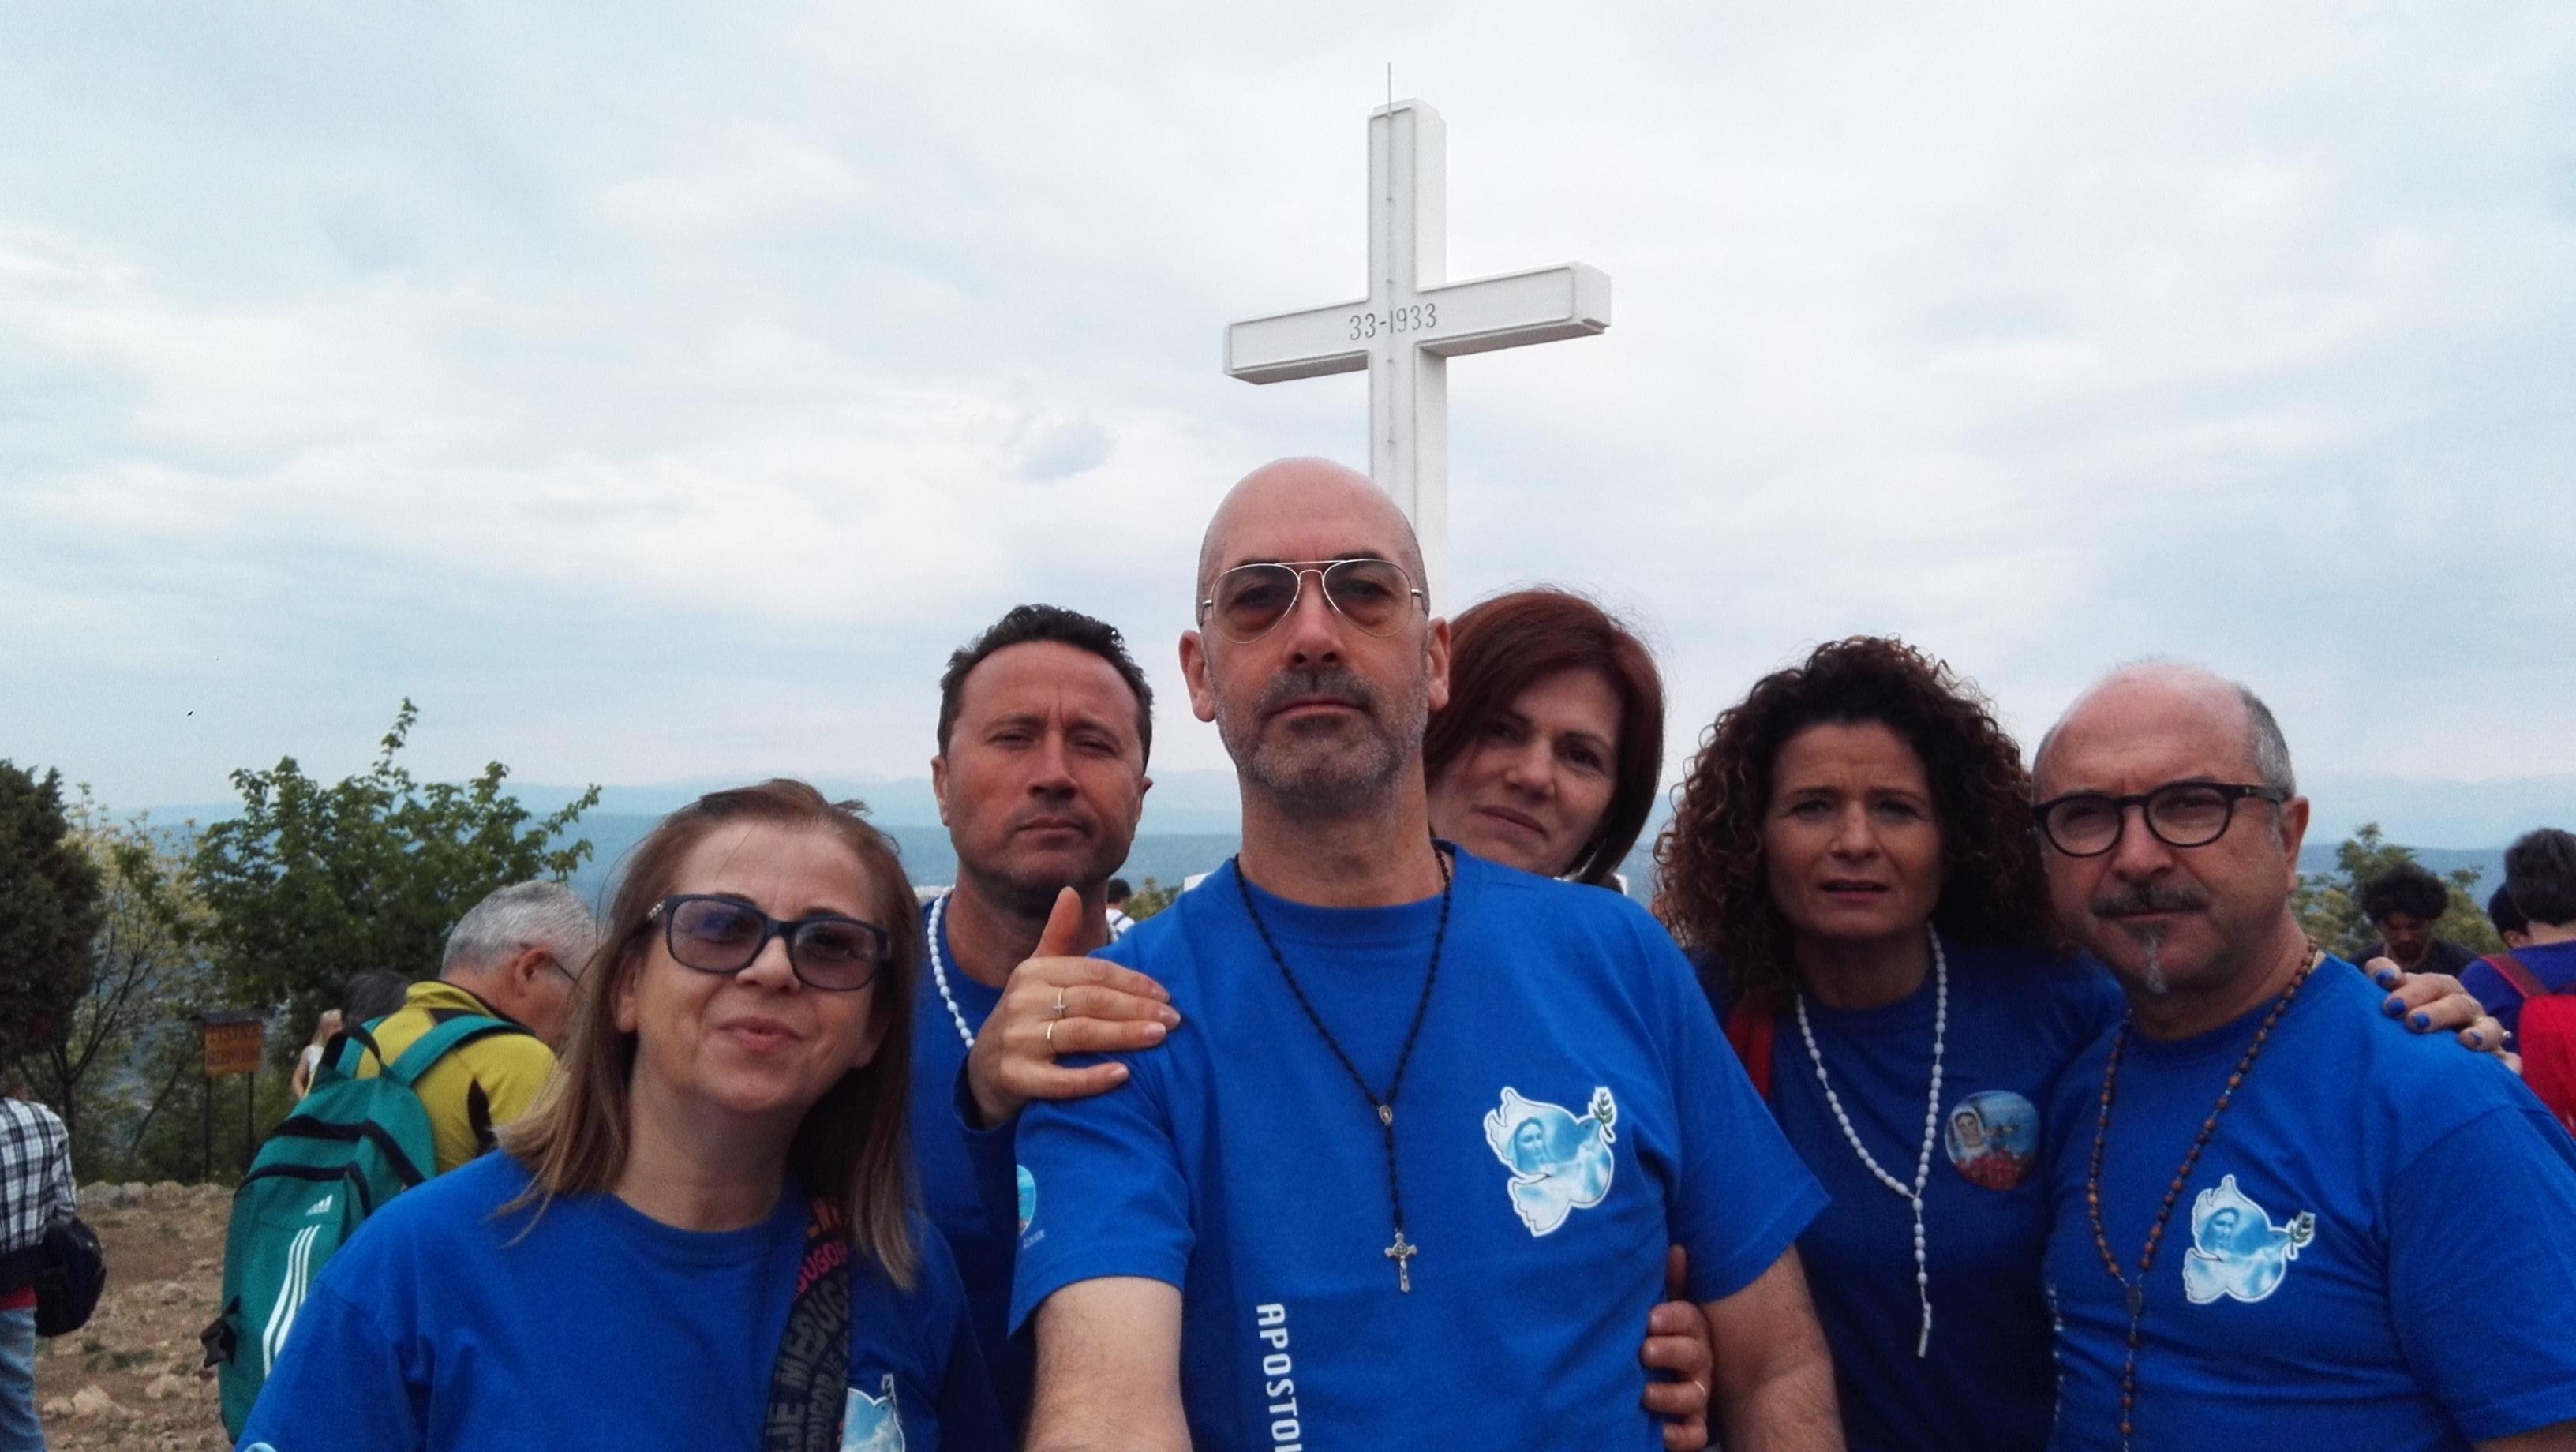 http://www.ilsorrisodimaria.it/wp-content/uploads/2018/08/IMG_20180430_093425.jpg